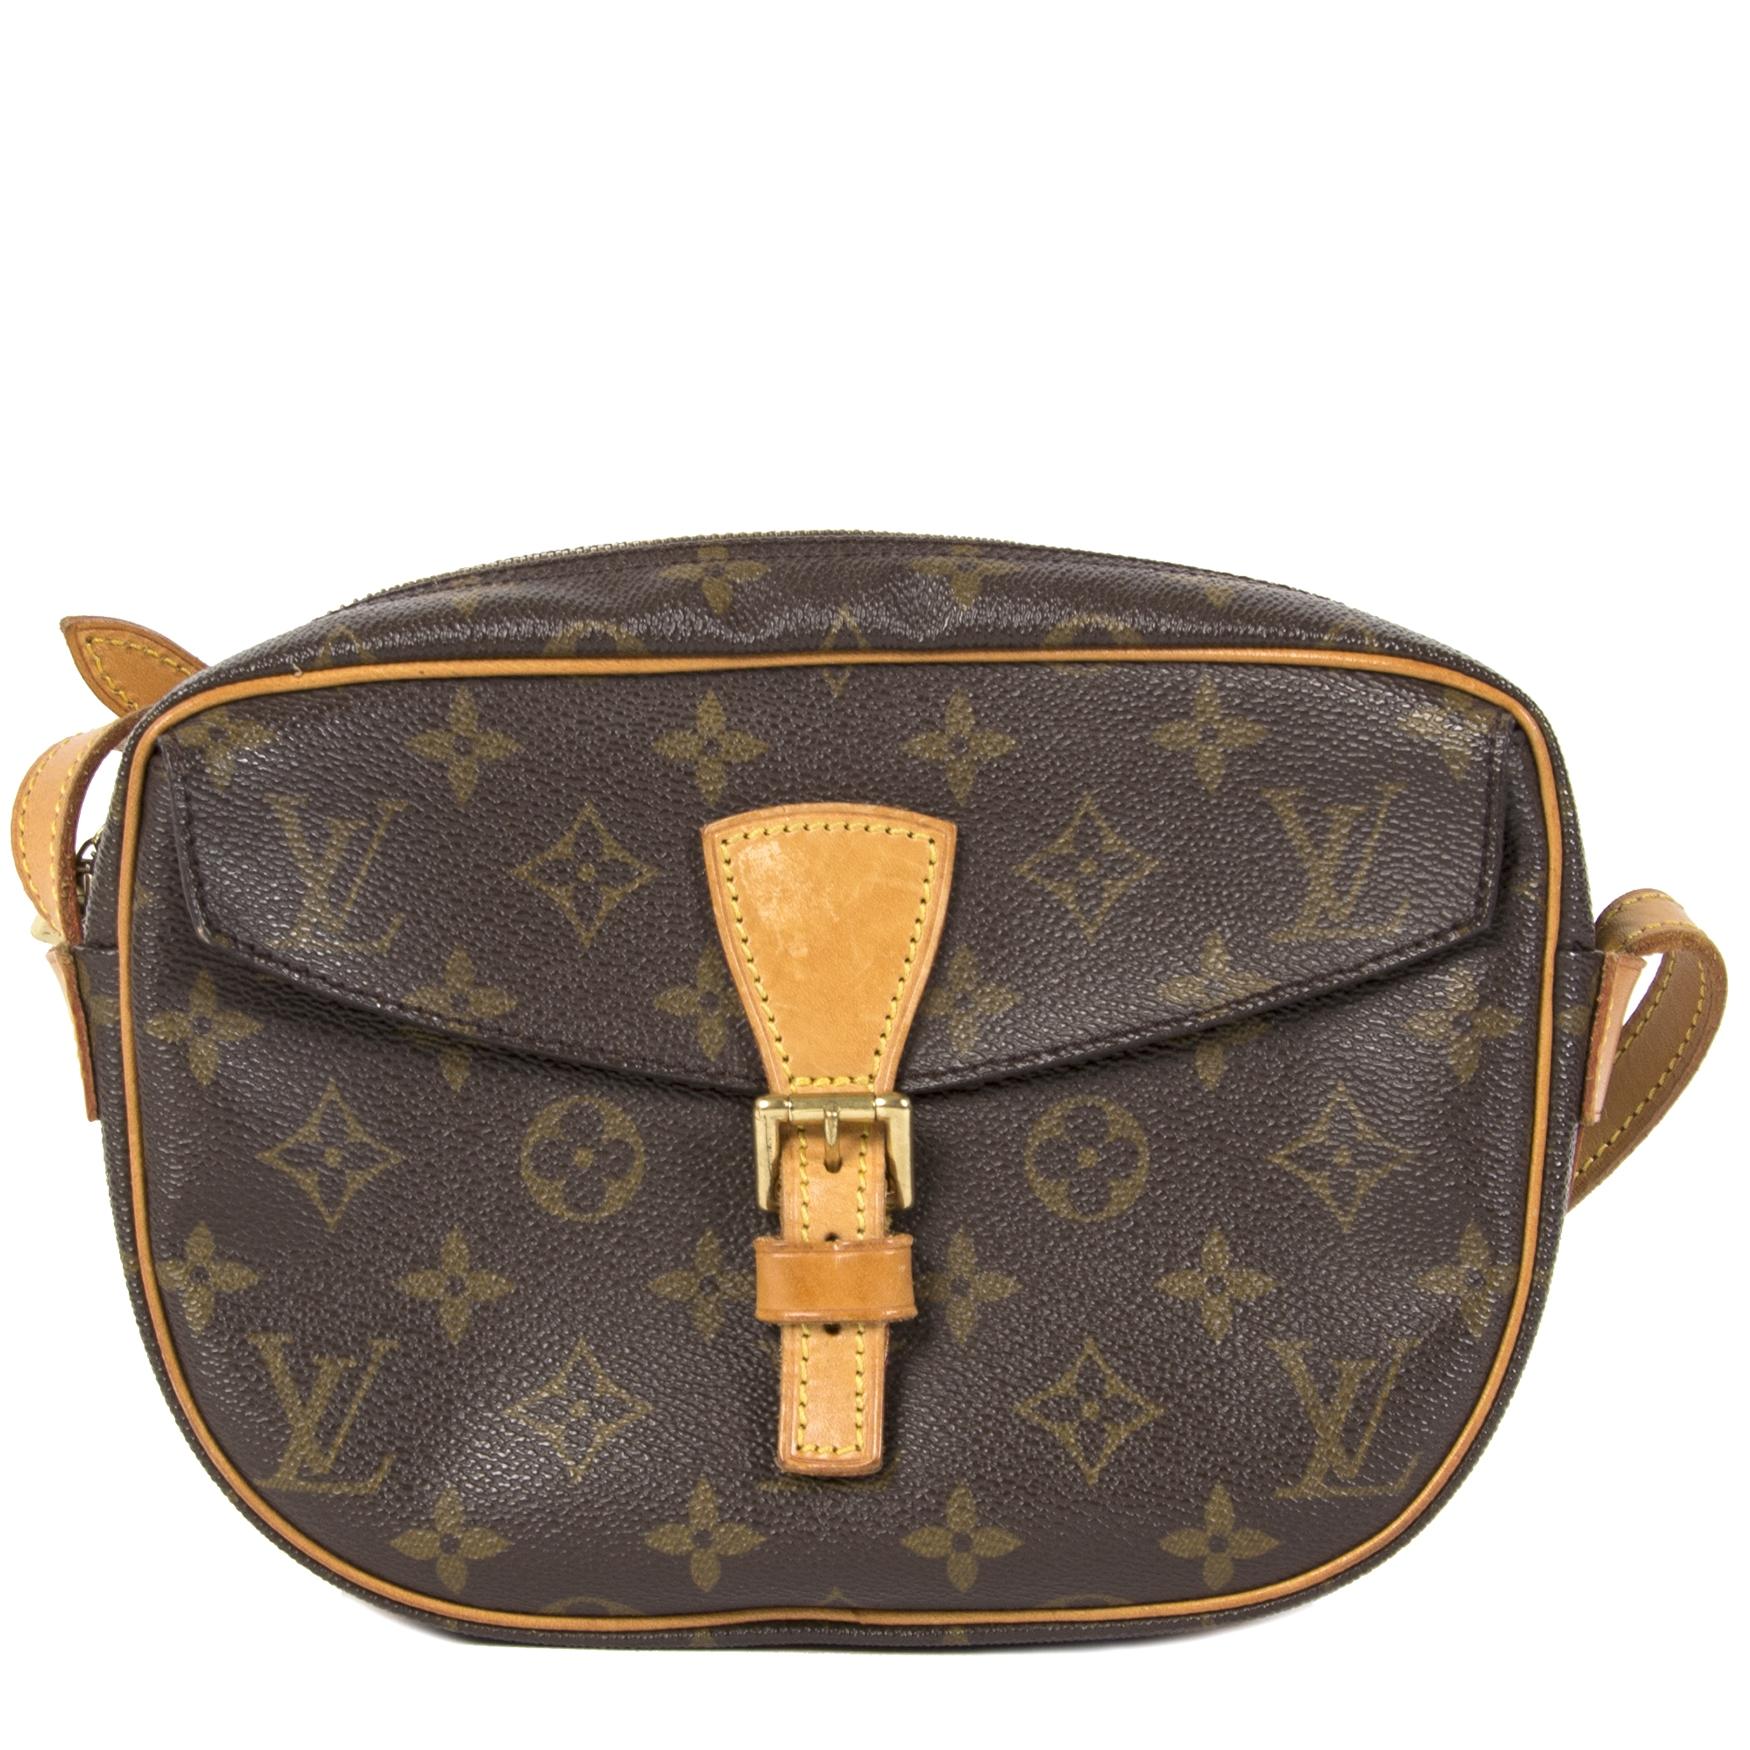 acheter en linge secnode main Louis Vuitton Jeune Fille MM Crossbody Bag